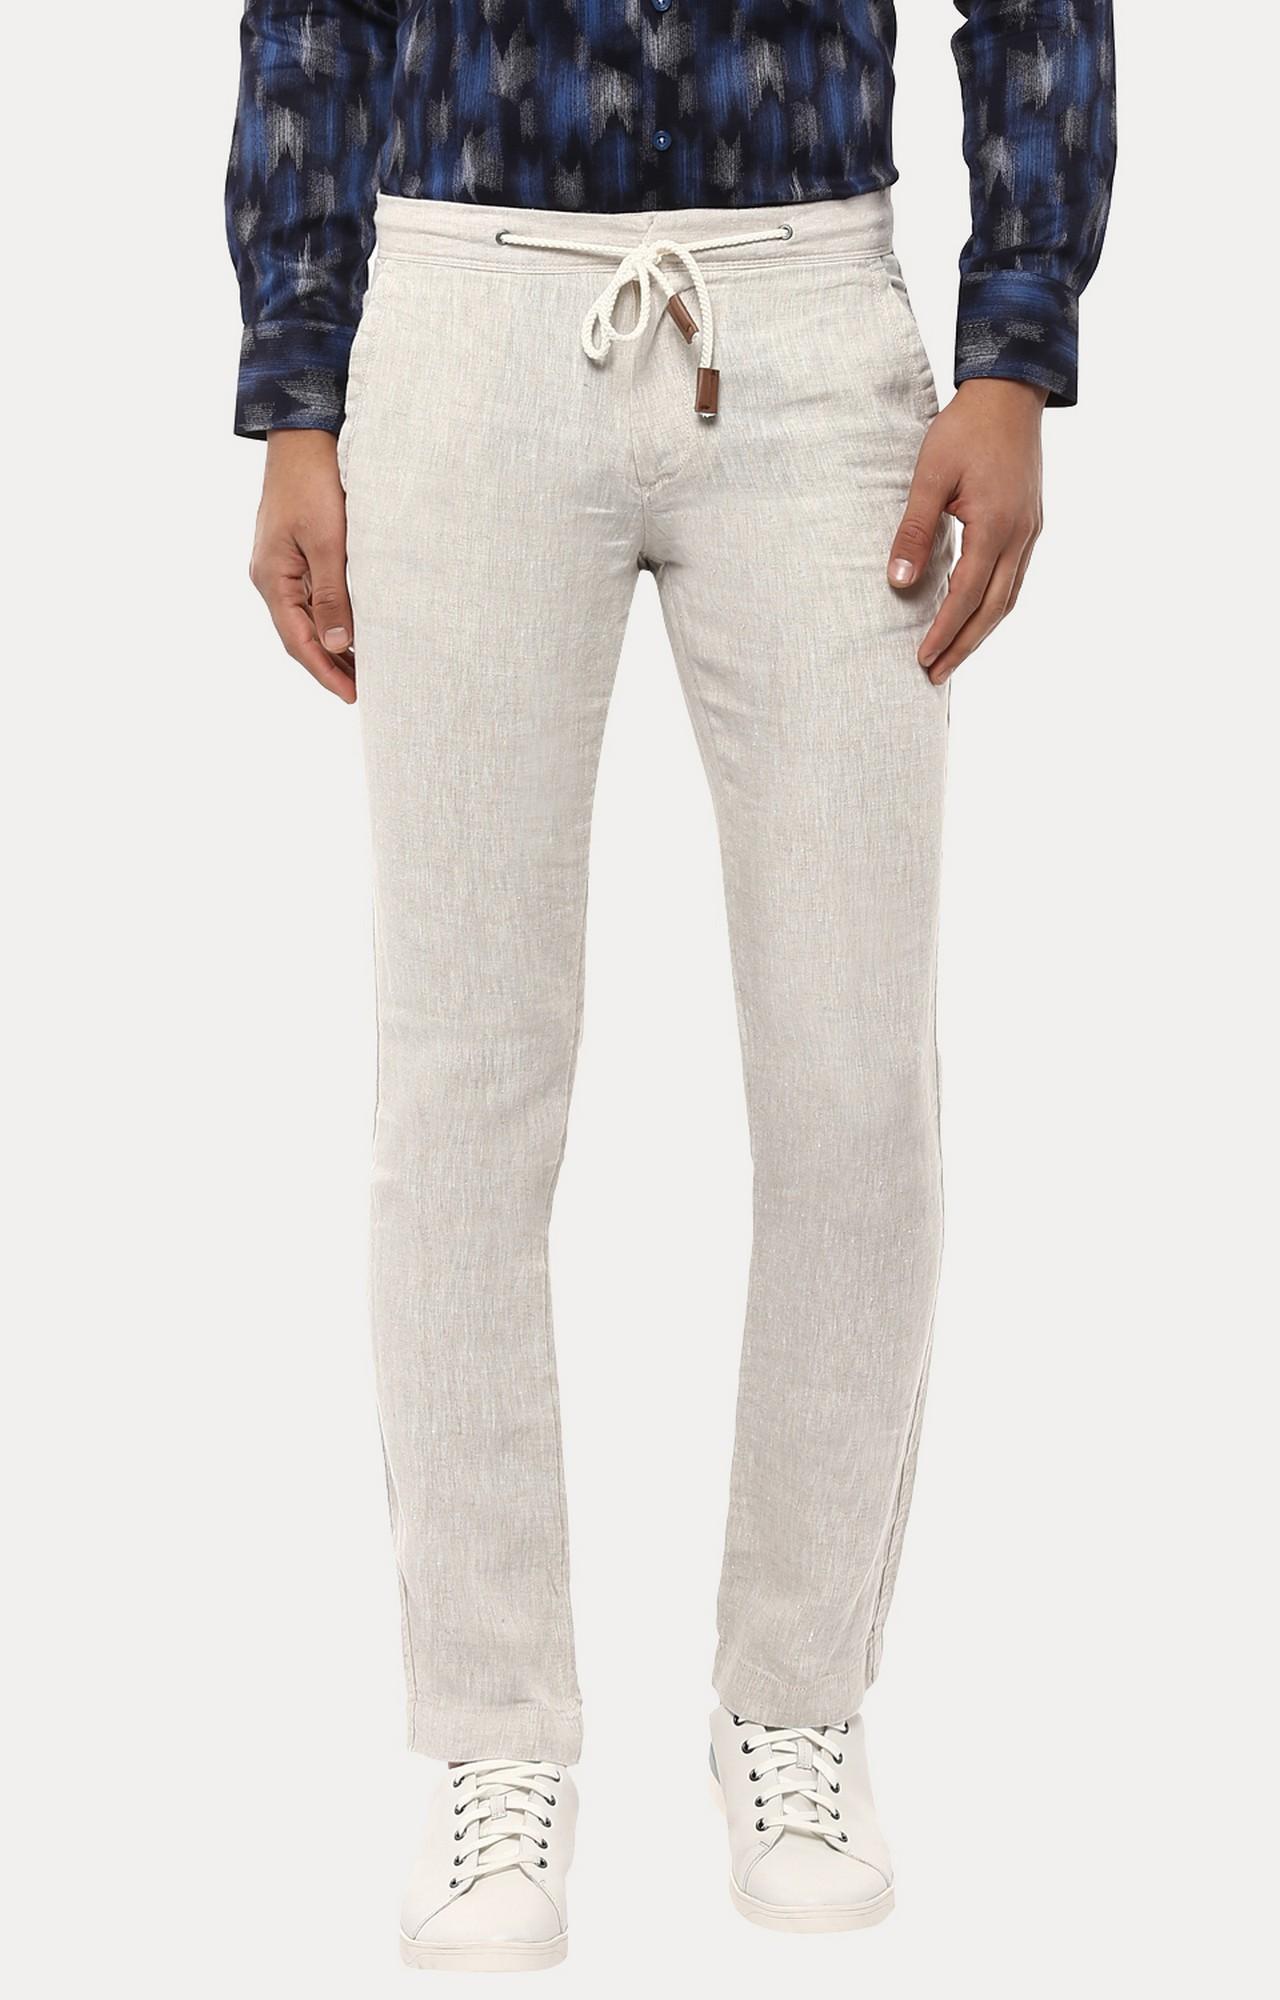 celio   White 100% Linen Straight Pants